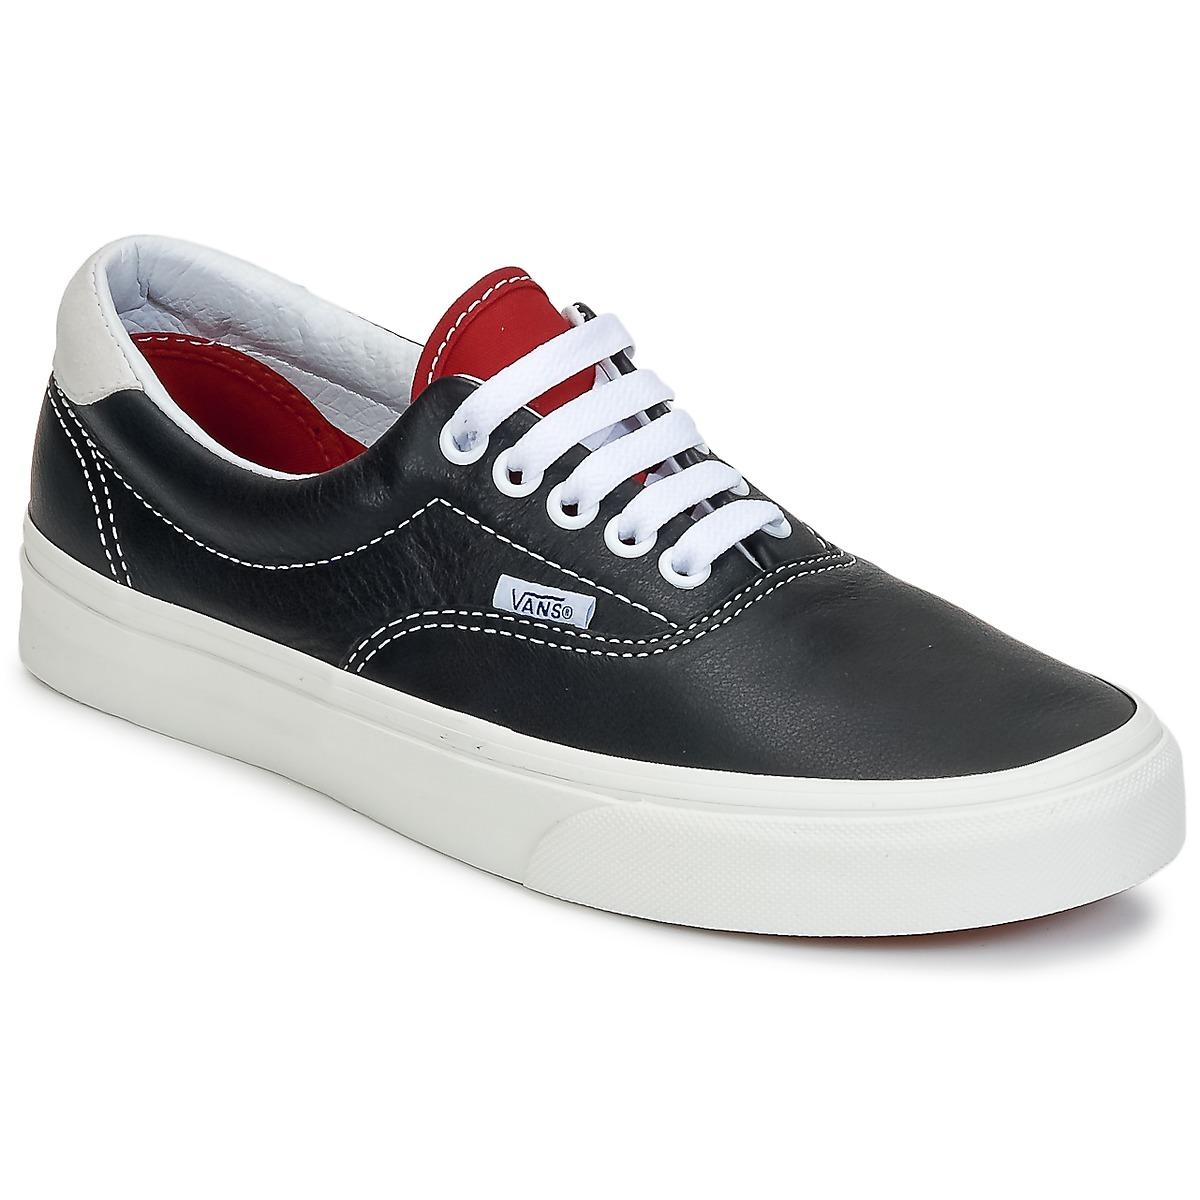 62e320d72f5918 Vans Era 59 Shoes (trainers) in Black - Lyst